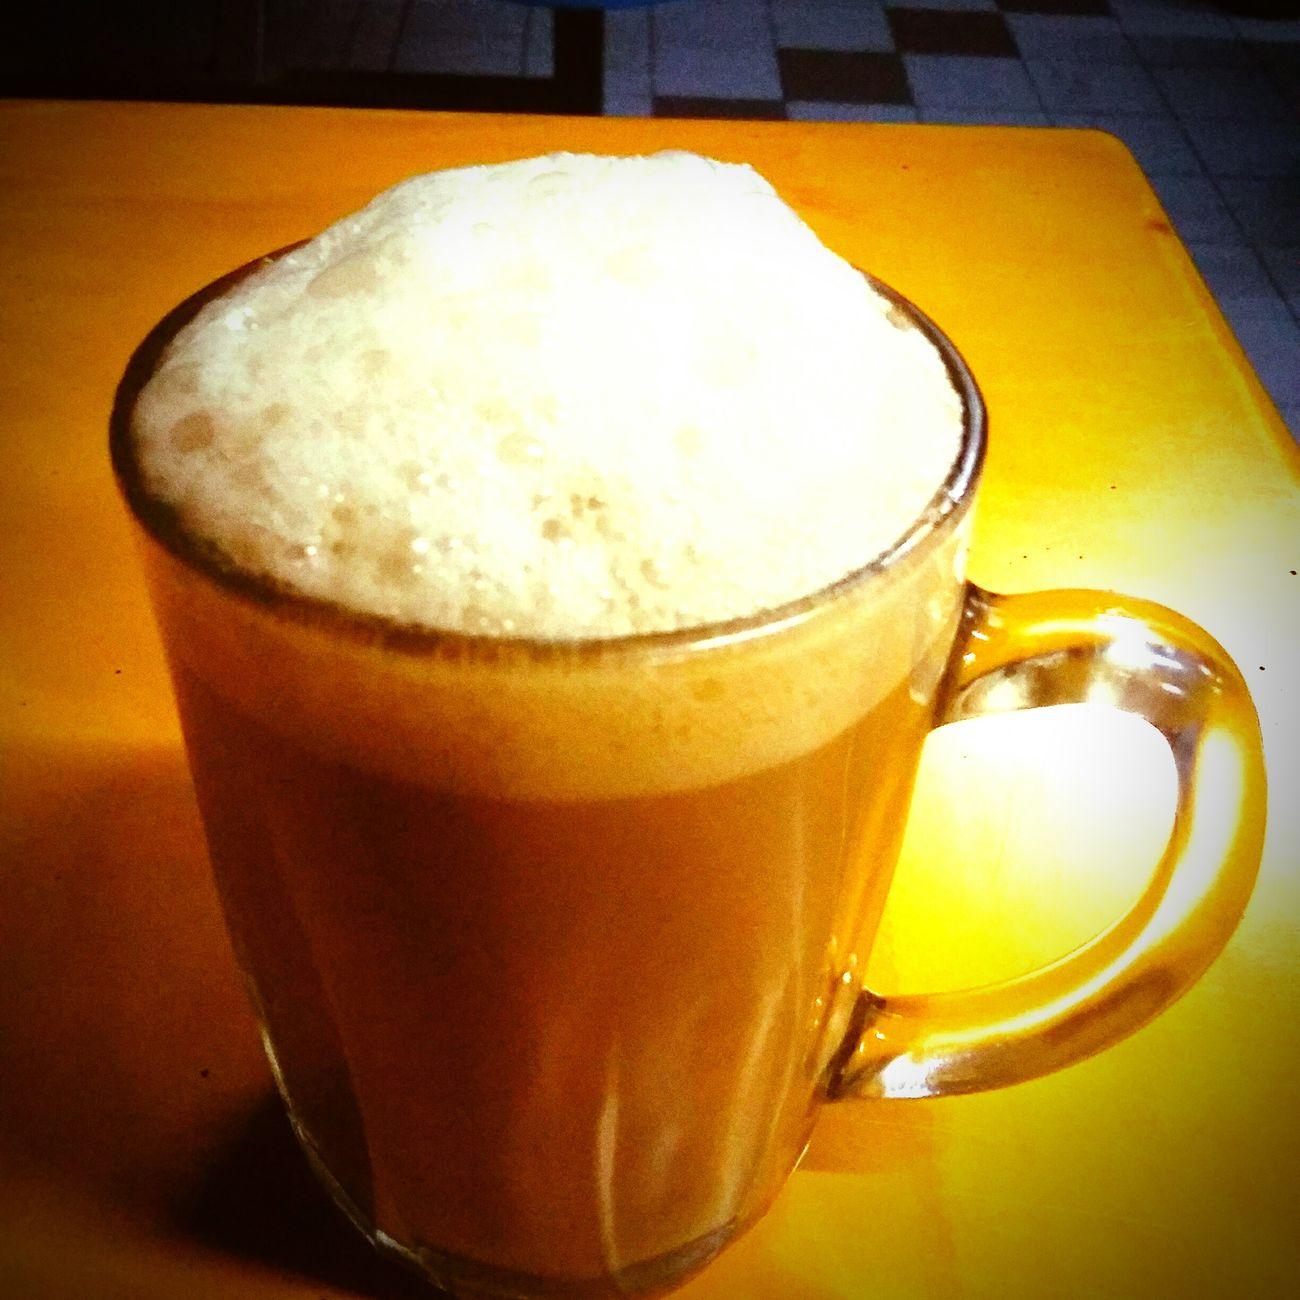 Drinkin Nescafe Nescafesuam Nescafewithlove Nescafe Tarik In My Place